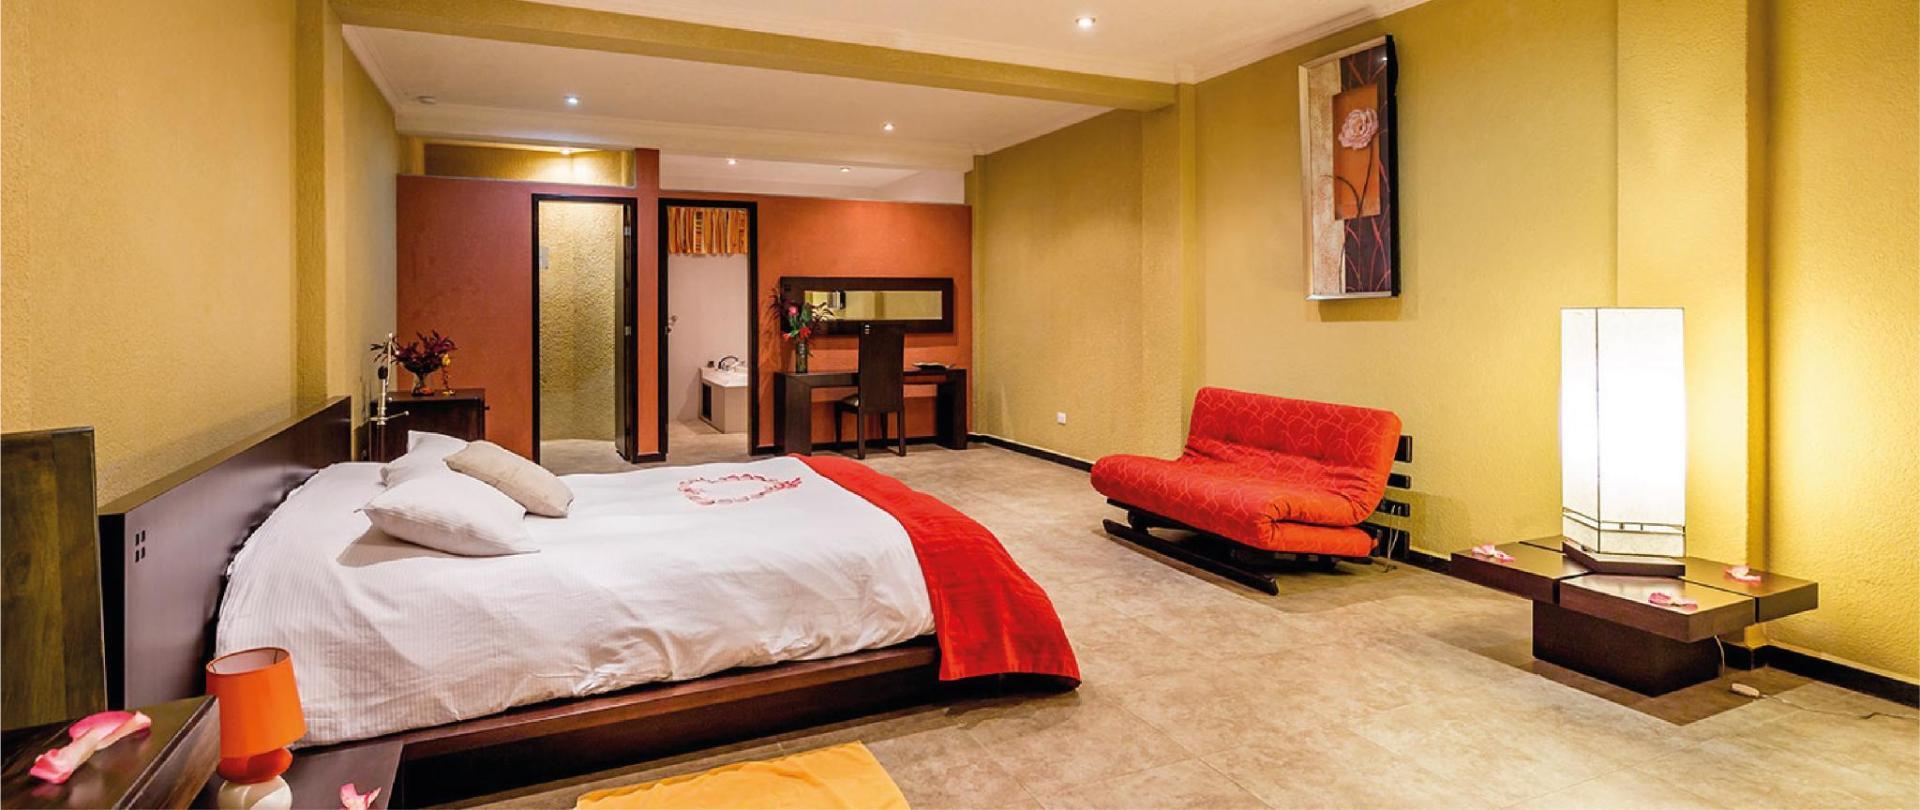 Yumbo-Spa-y-Resort-Hotel-en-Gualea-Master-suite.jpg